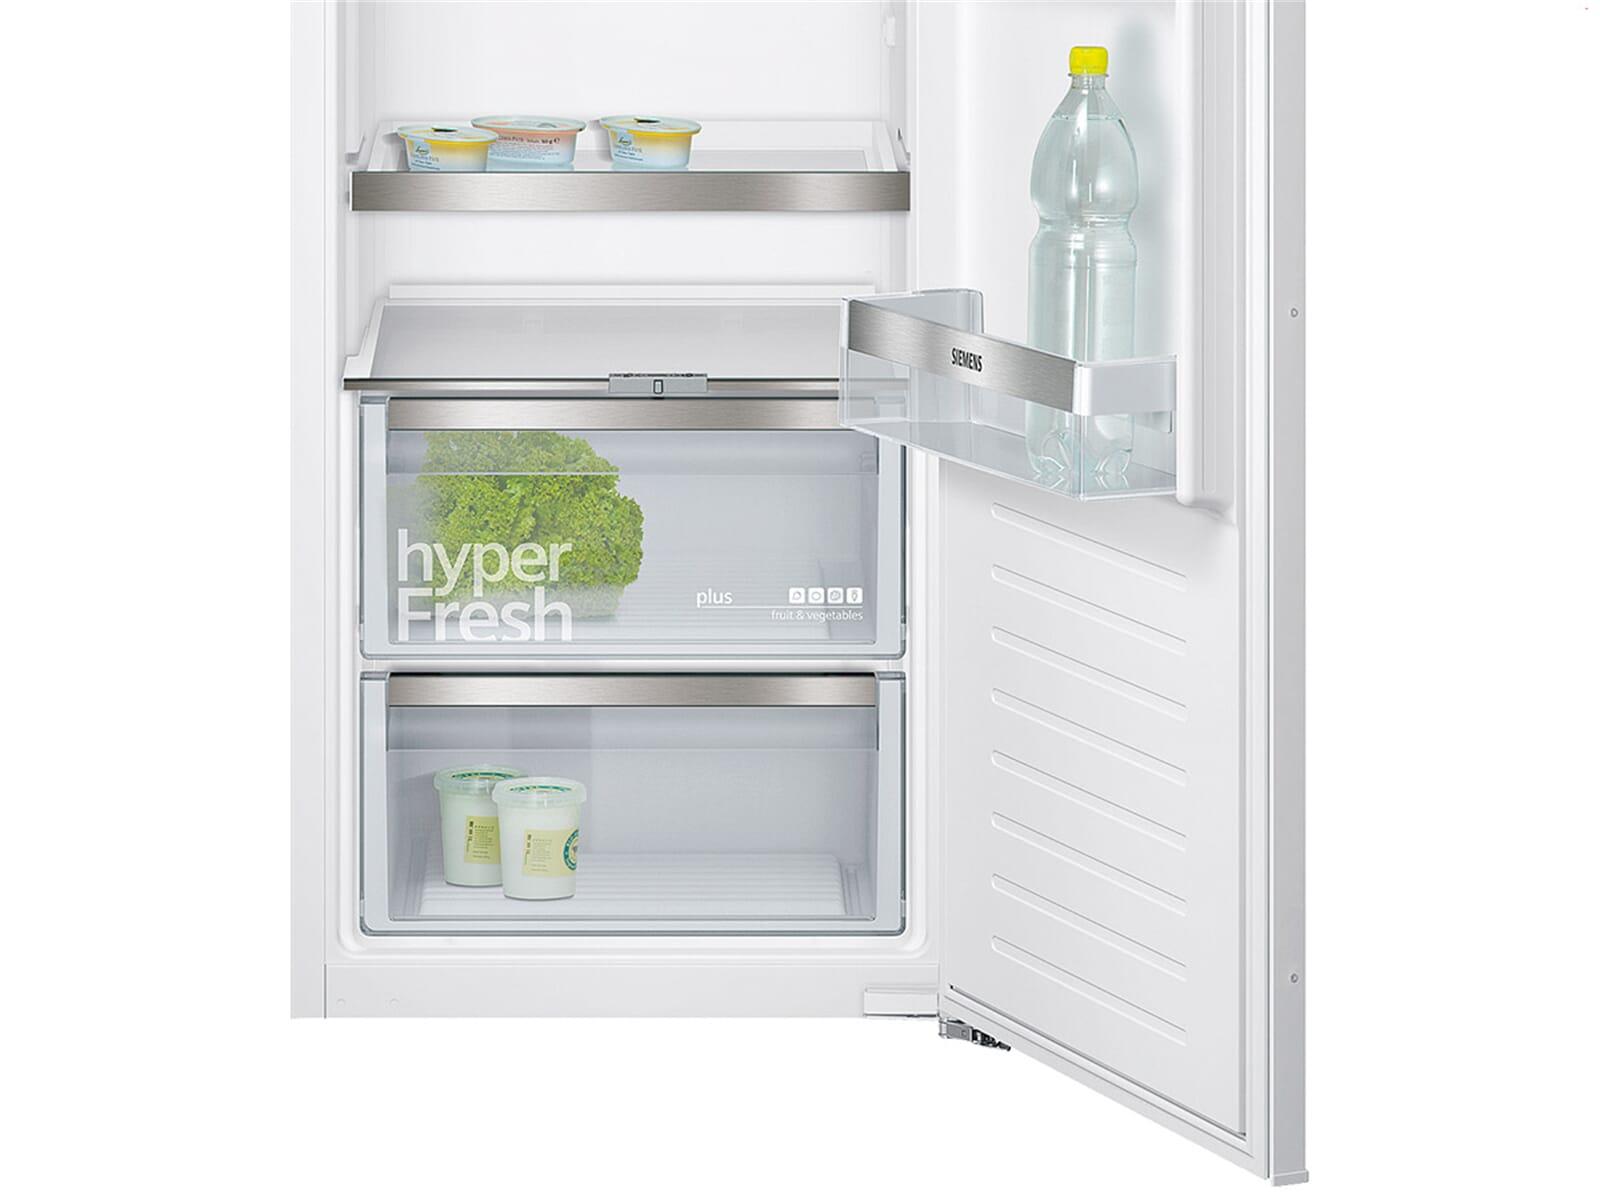 Siemens Kühlschrank Hyperfresh : Siemens ki lad einbaukühlschrank